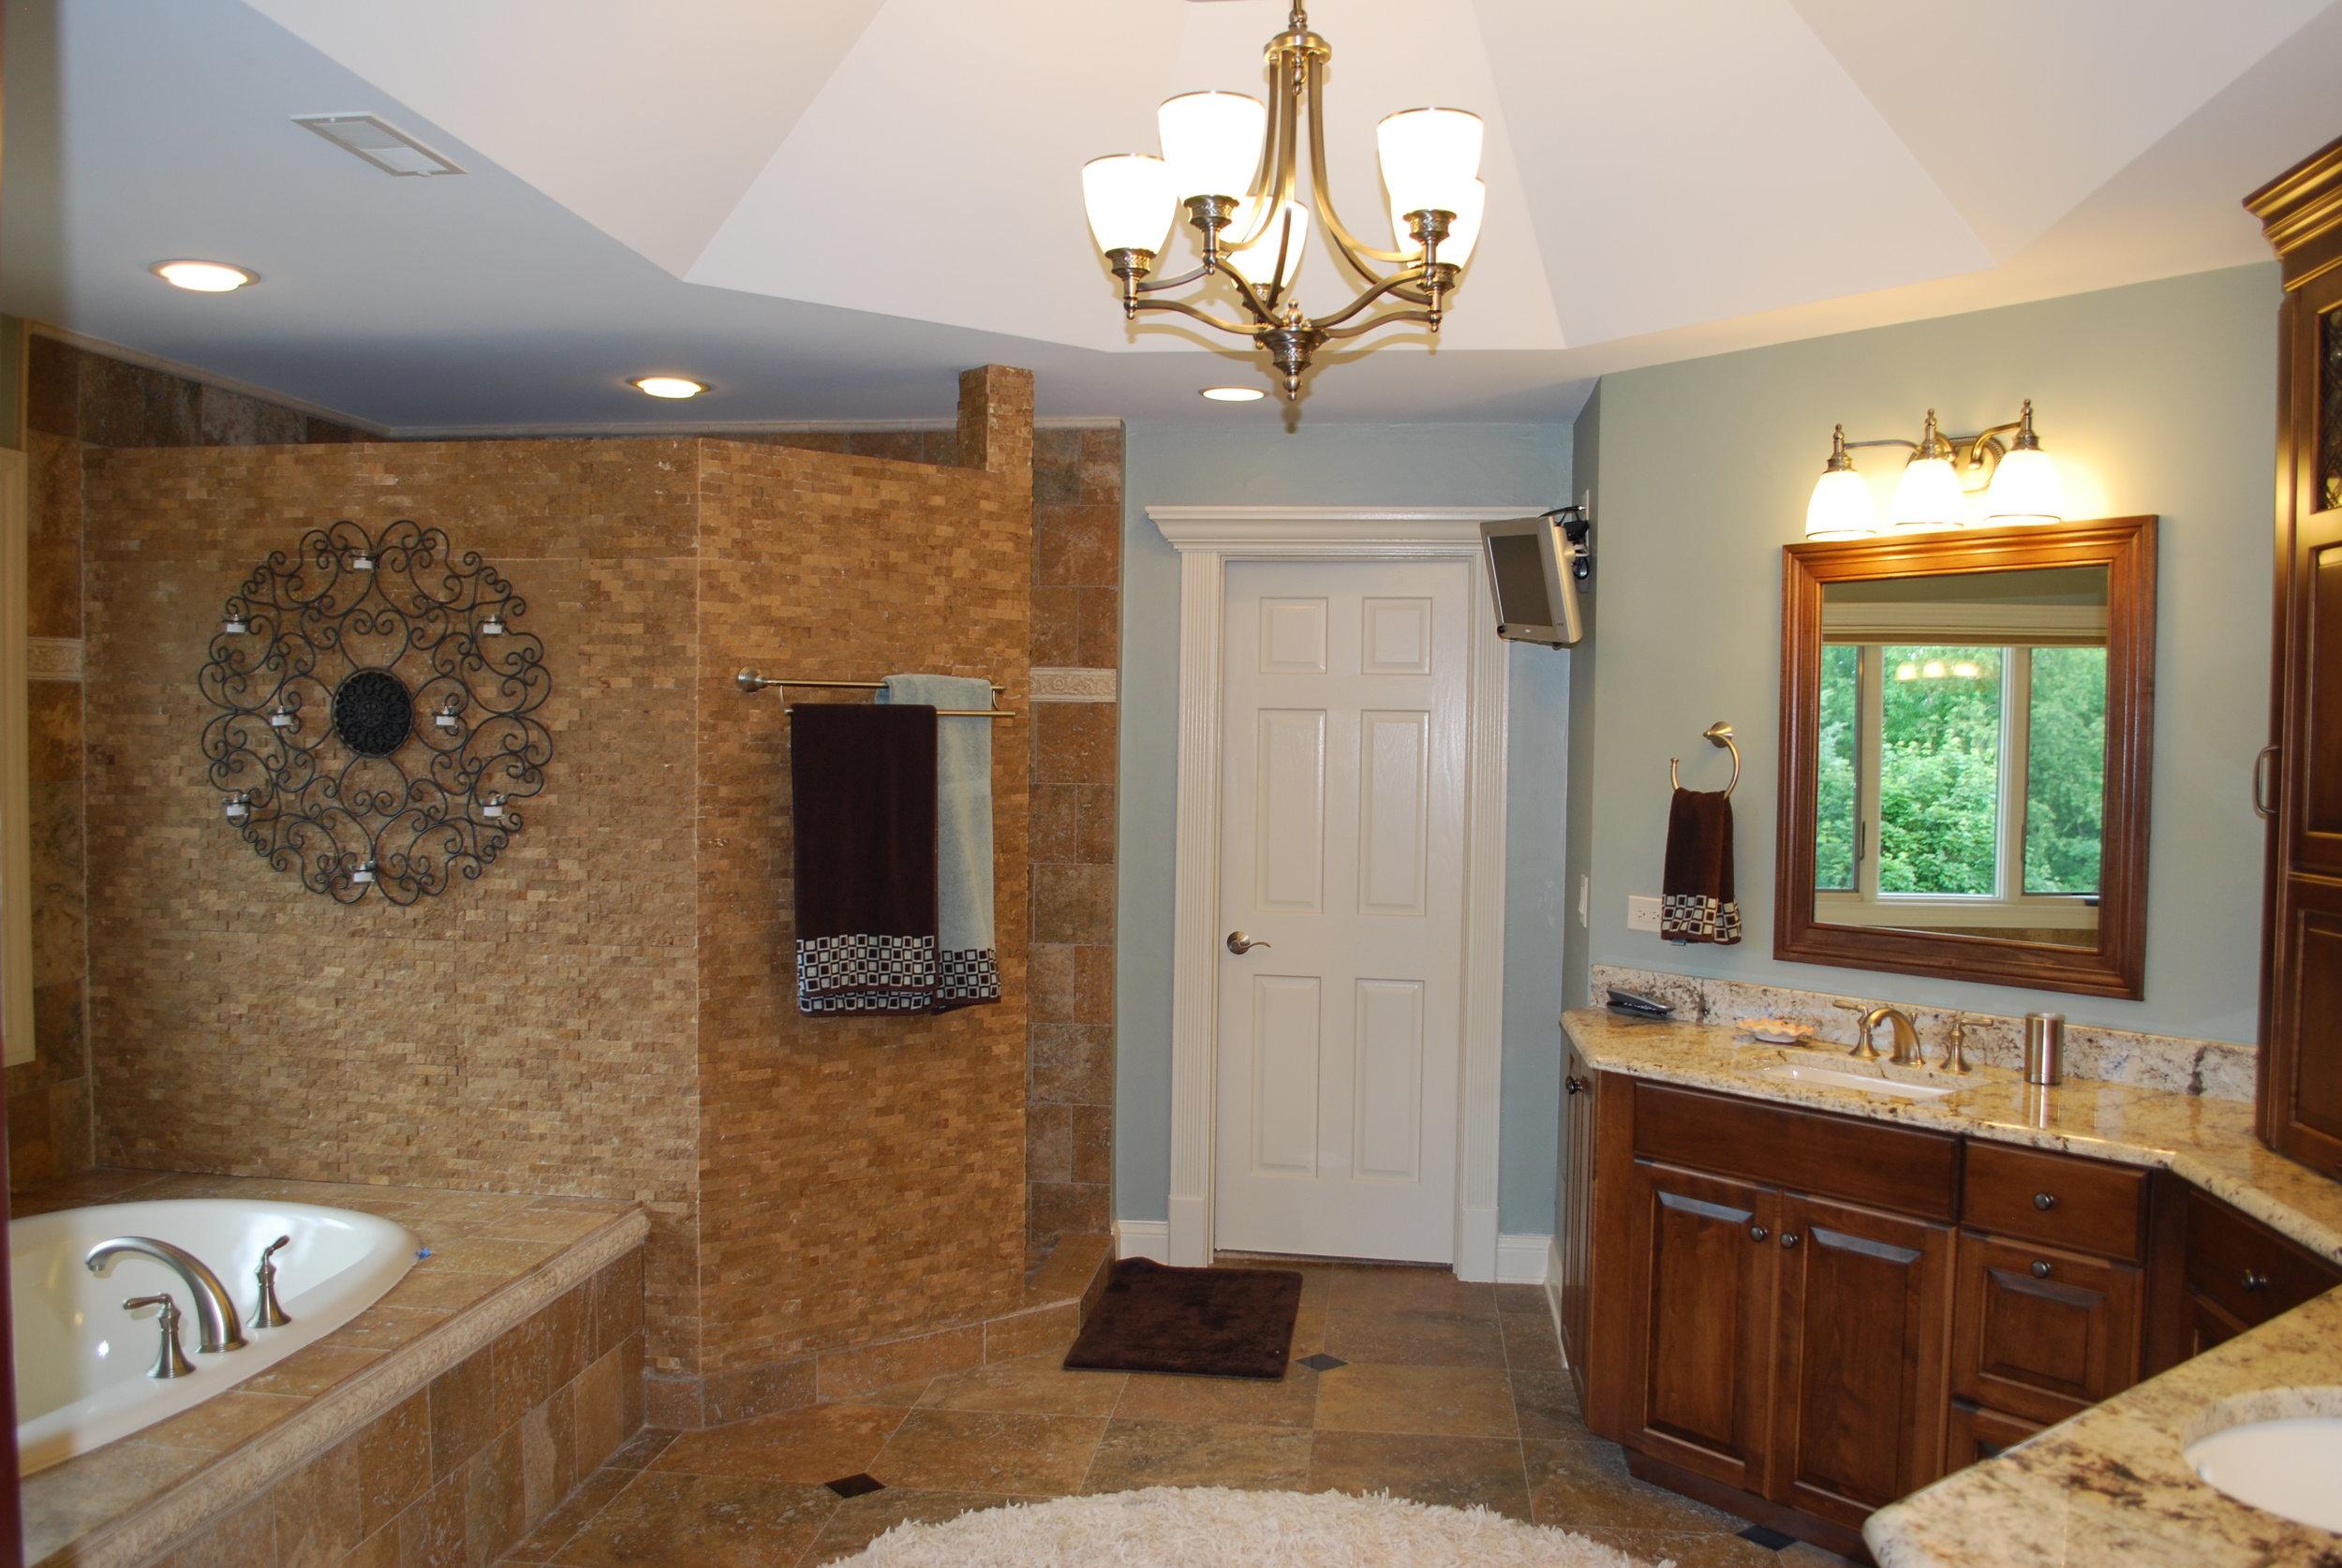 HOME BATHROOM RENOVATIONS SAINT CHARLES IL